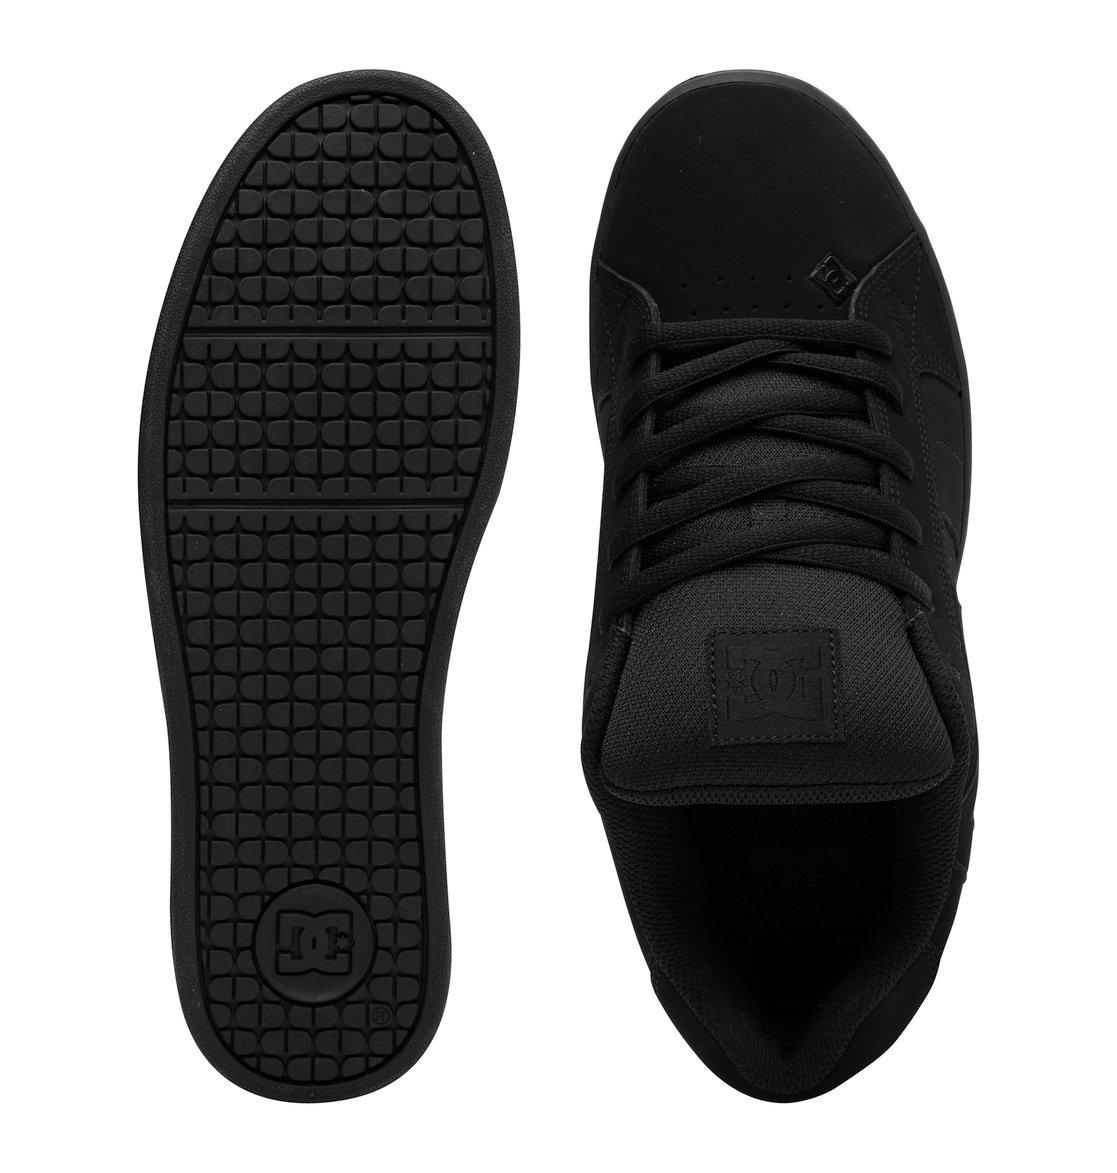 DC - Sneaker NET 302361 - wheat black dark chocolate, Taille:55 EU